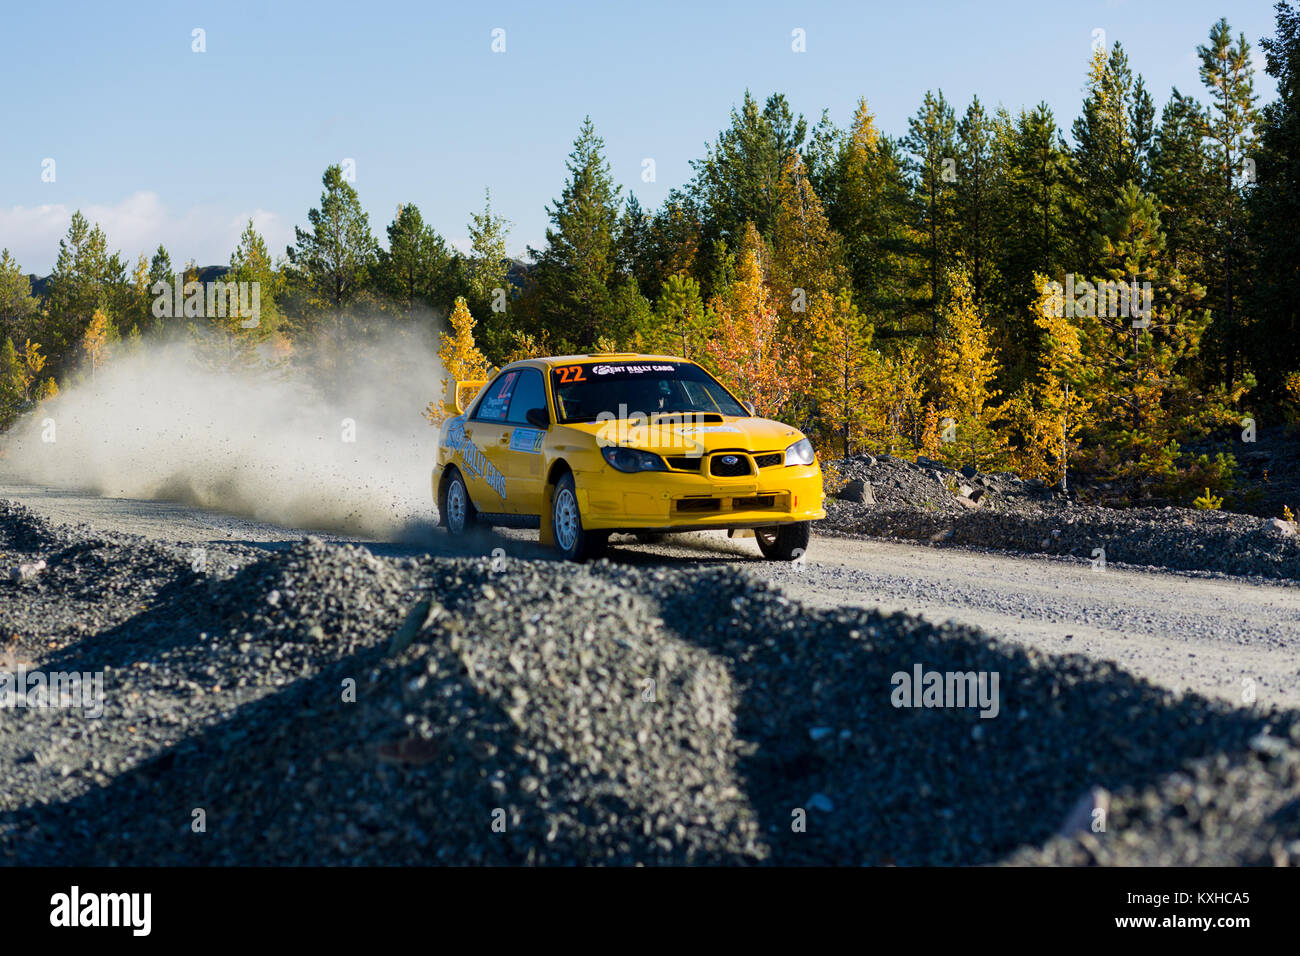 Asbest, Russland, September 17, 2017 - 16 Phase der Russischen Cup rally'S 2017 tilobite 2017', Auto Subaru Stockbild